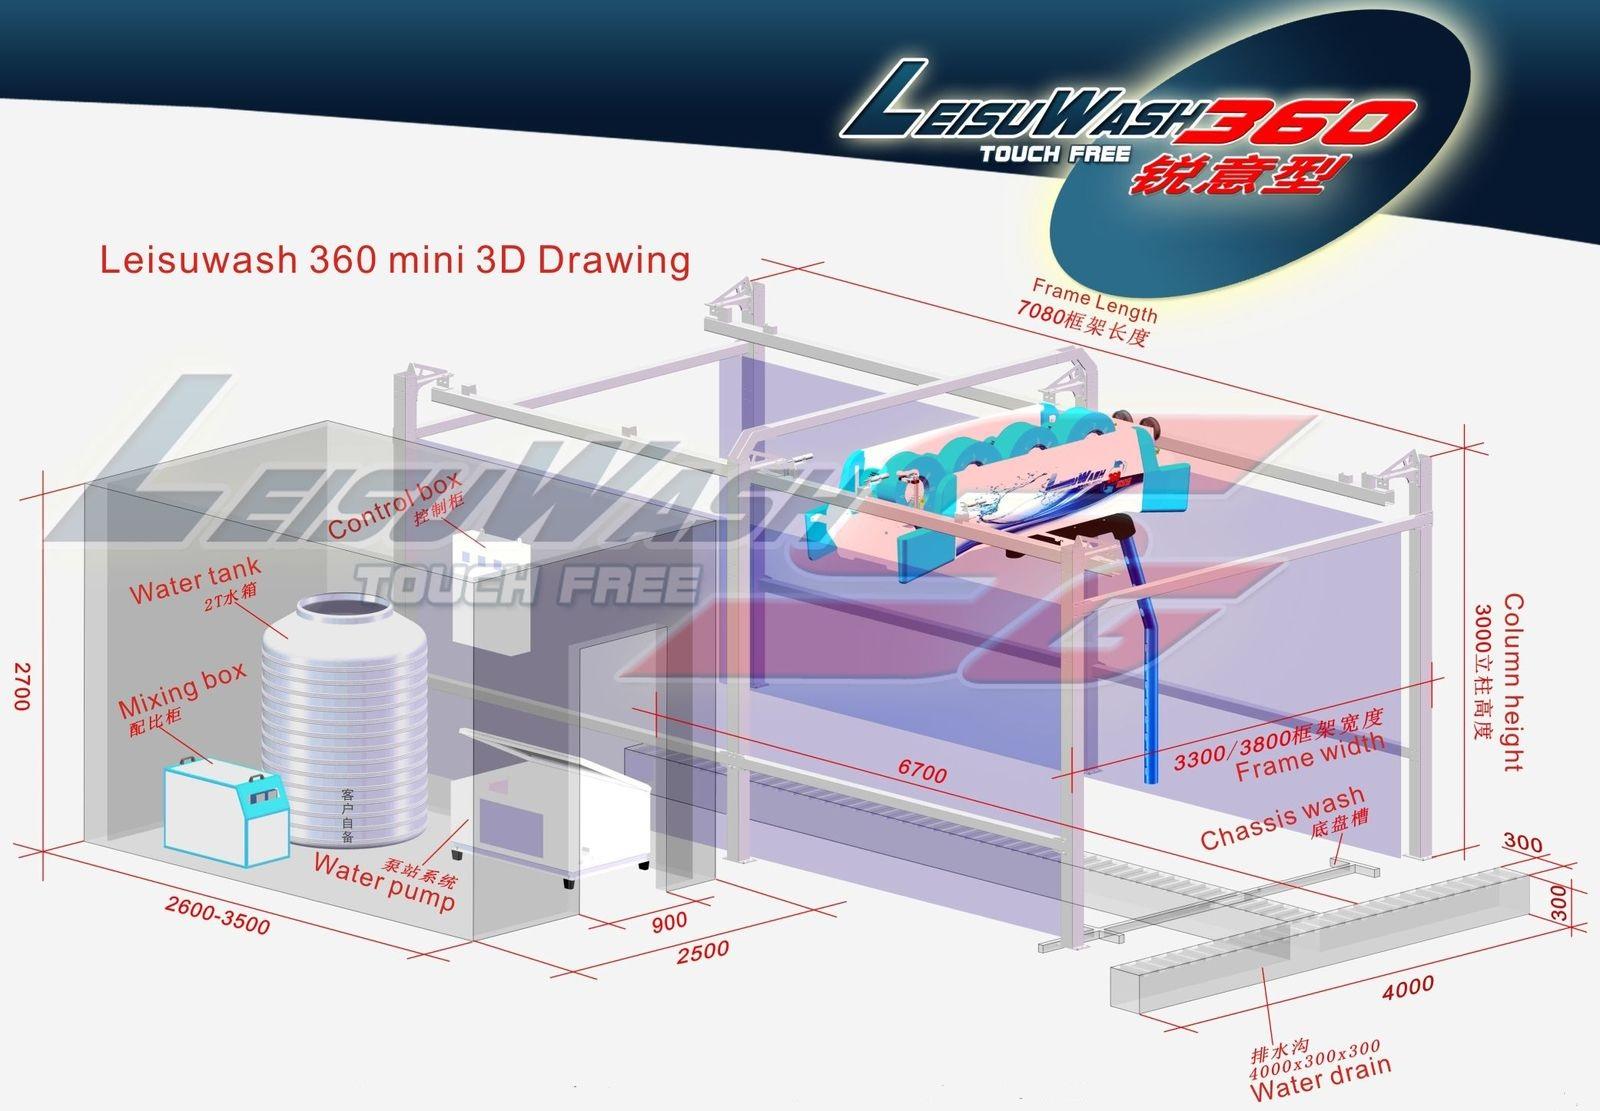 hight resolution of leisuwash 360 mini car wash machine leisuwash 360 automatic car wash equipment touchless